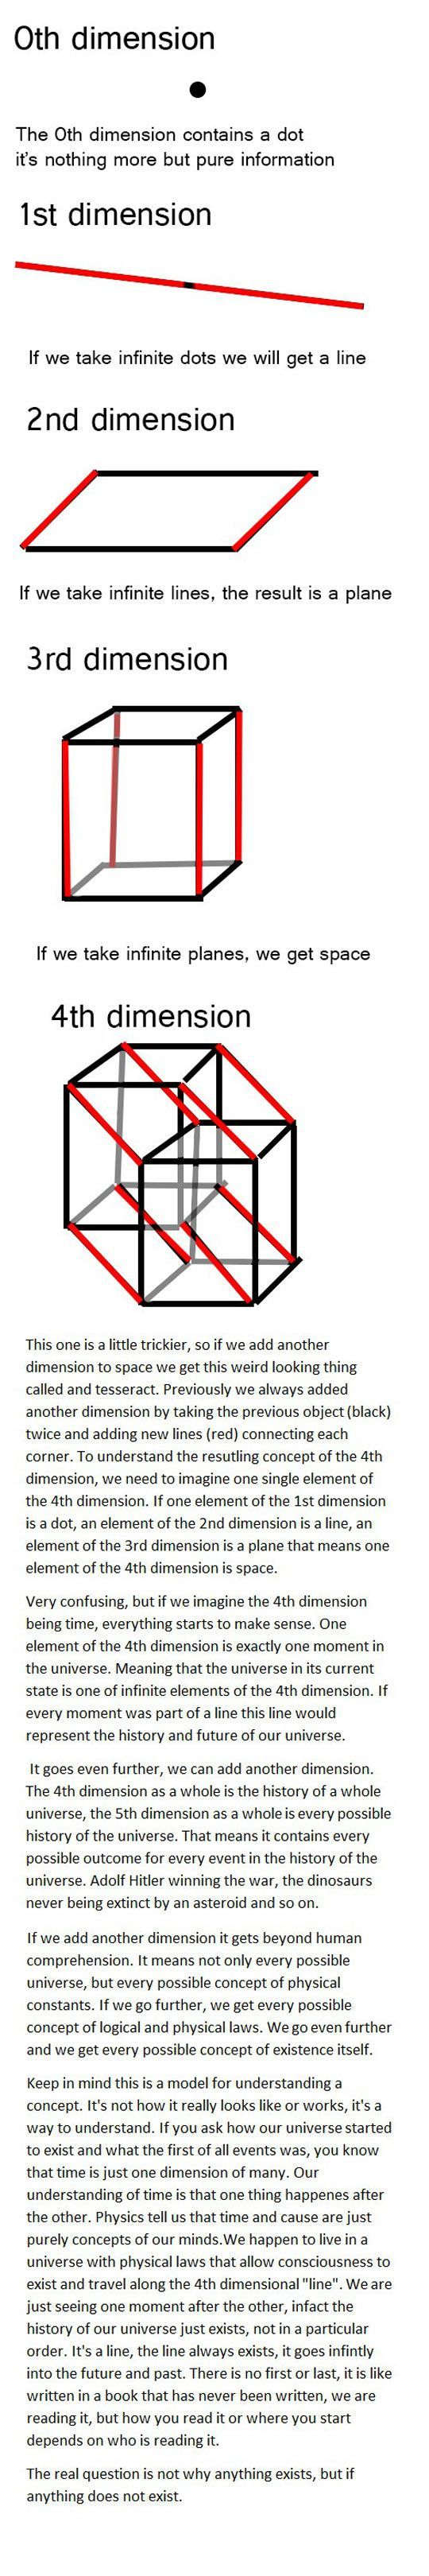 163 best Mathe und Studium images on Pinterest | Gym, Knowledge and ...